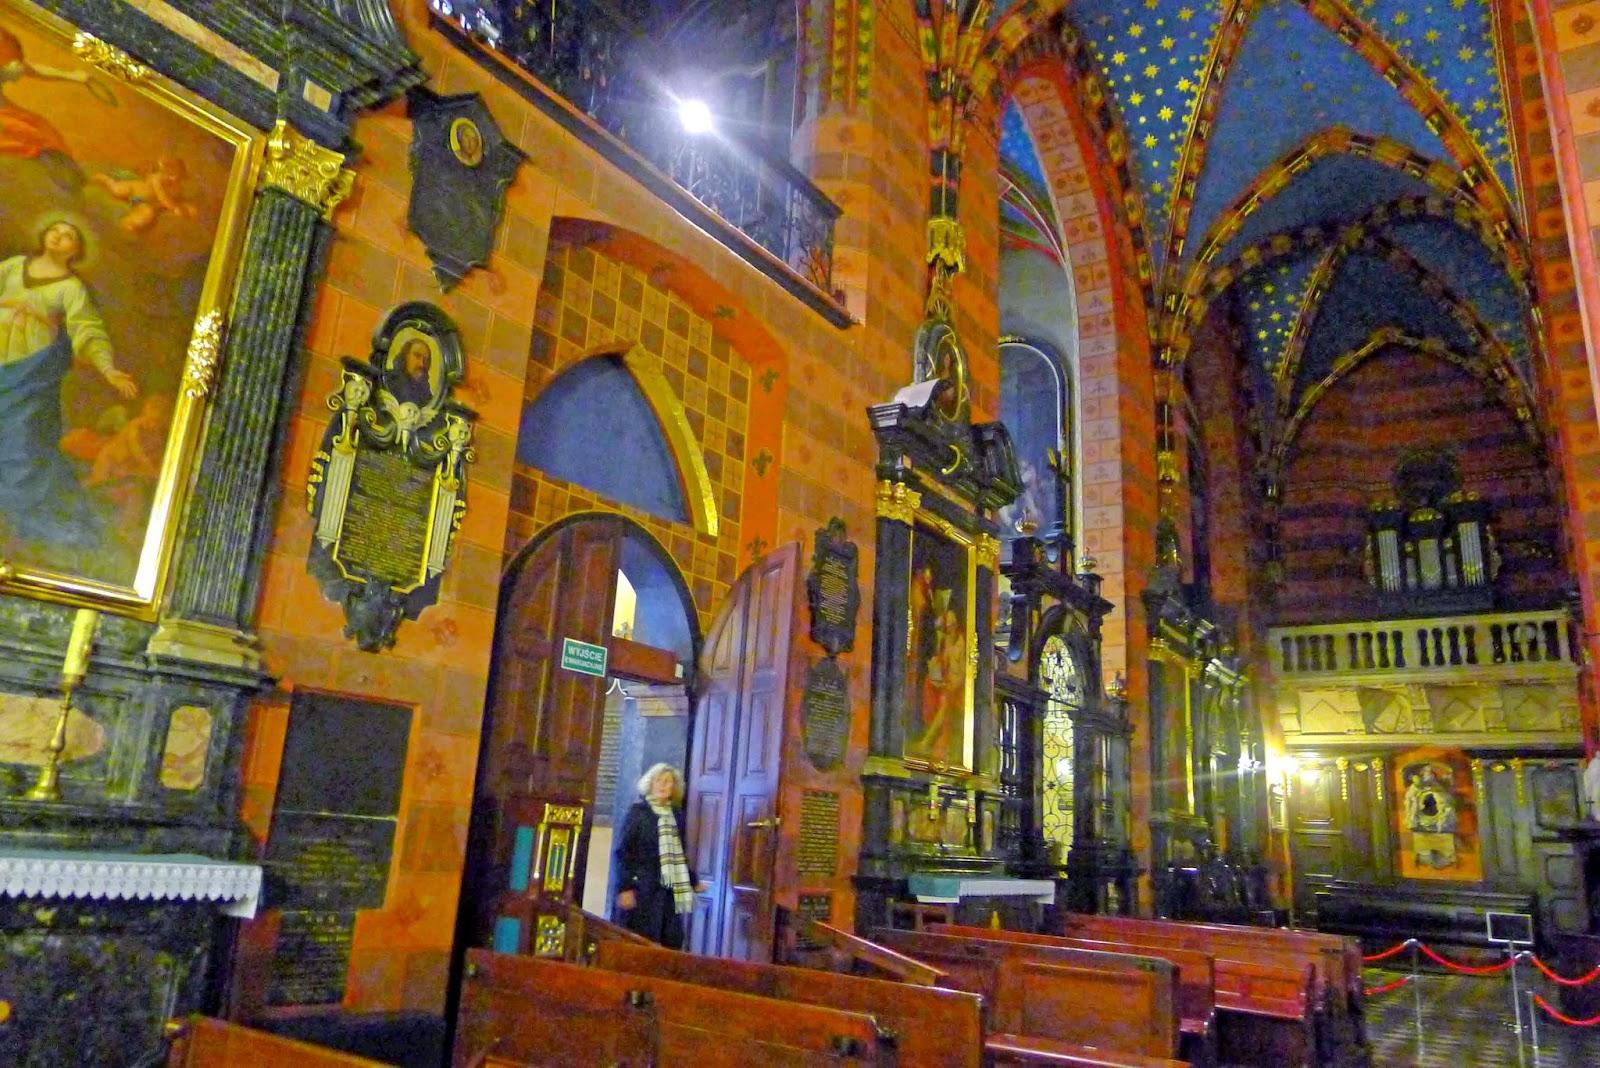 St. Mary's Basilica Interior